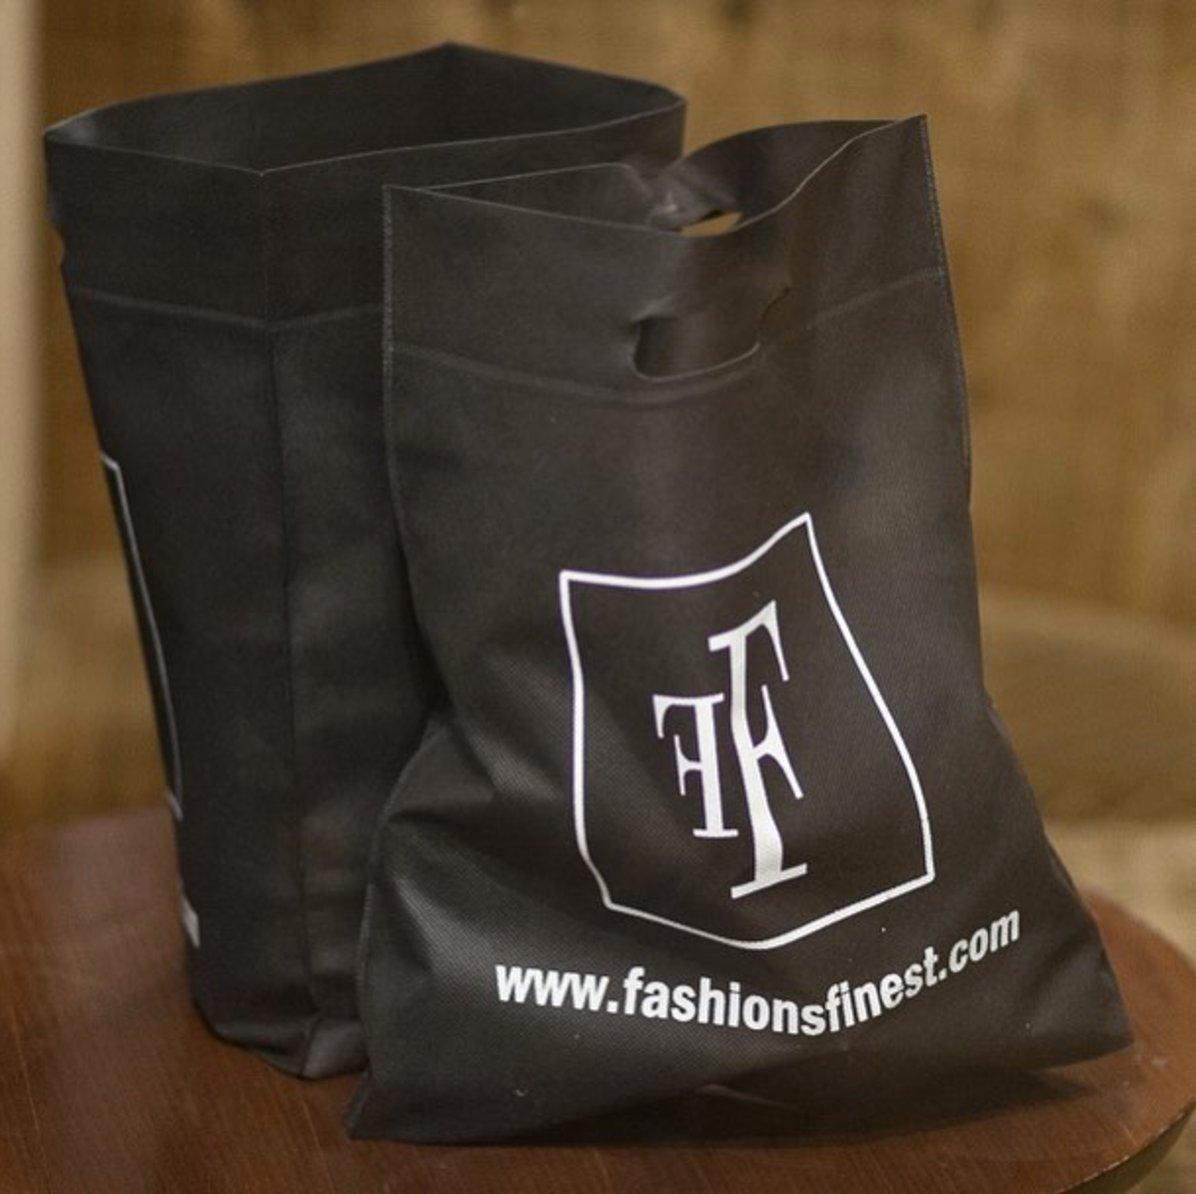 FASHIONS FINEST  #fashionsfinest #company #events #eventorganiser #fashionevent #catwalkshow #marketing  http://www. fashionsfinest.com  &nbsp;  <br>http://pic.twitter.com/miiwv1LPoN